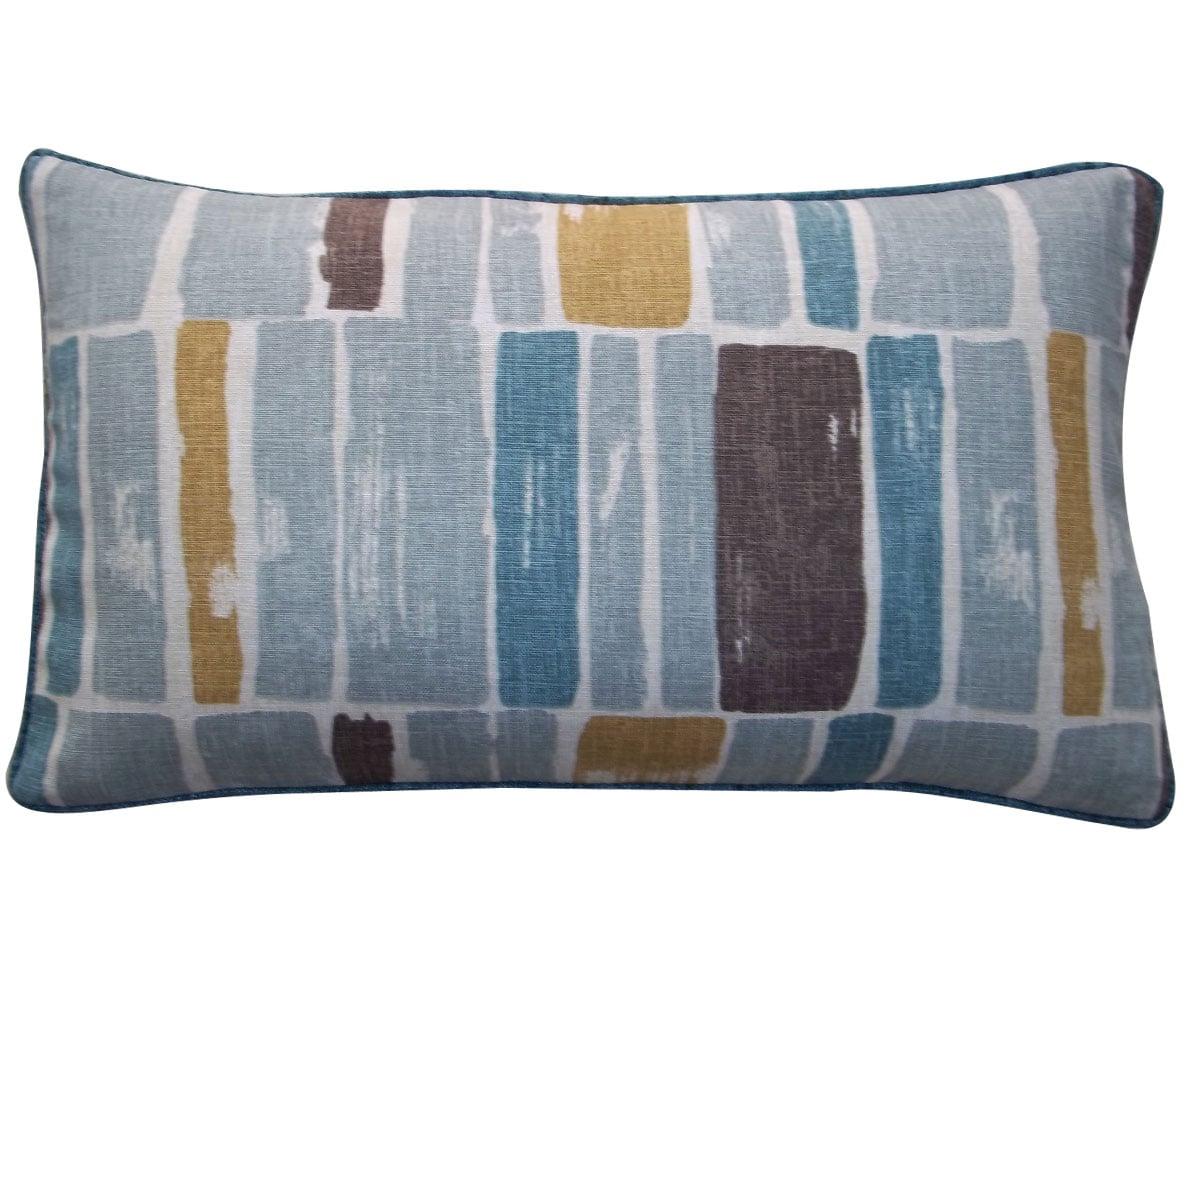 'Martin Wall' Throw Pillow